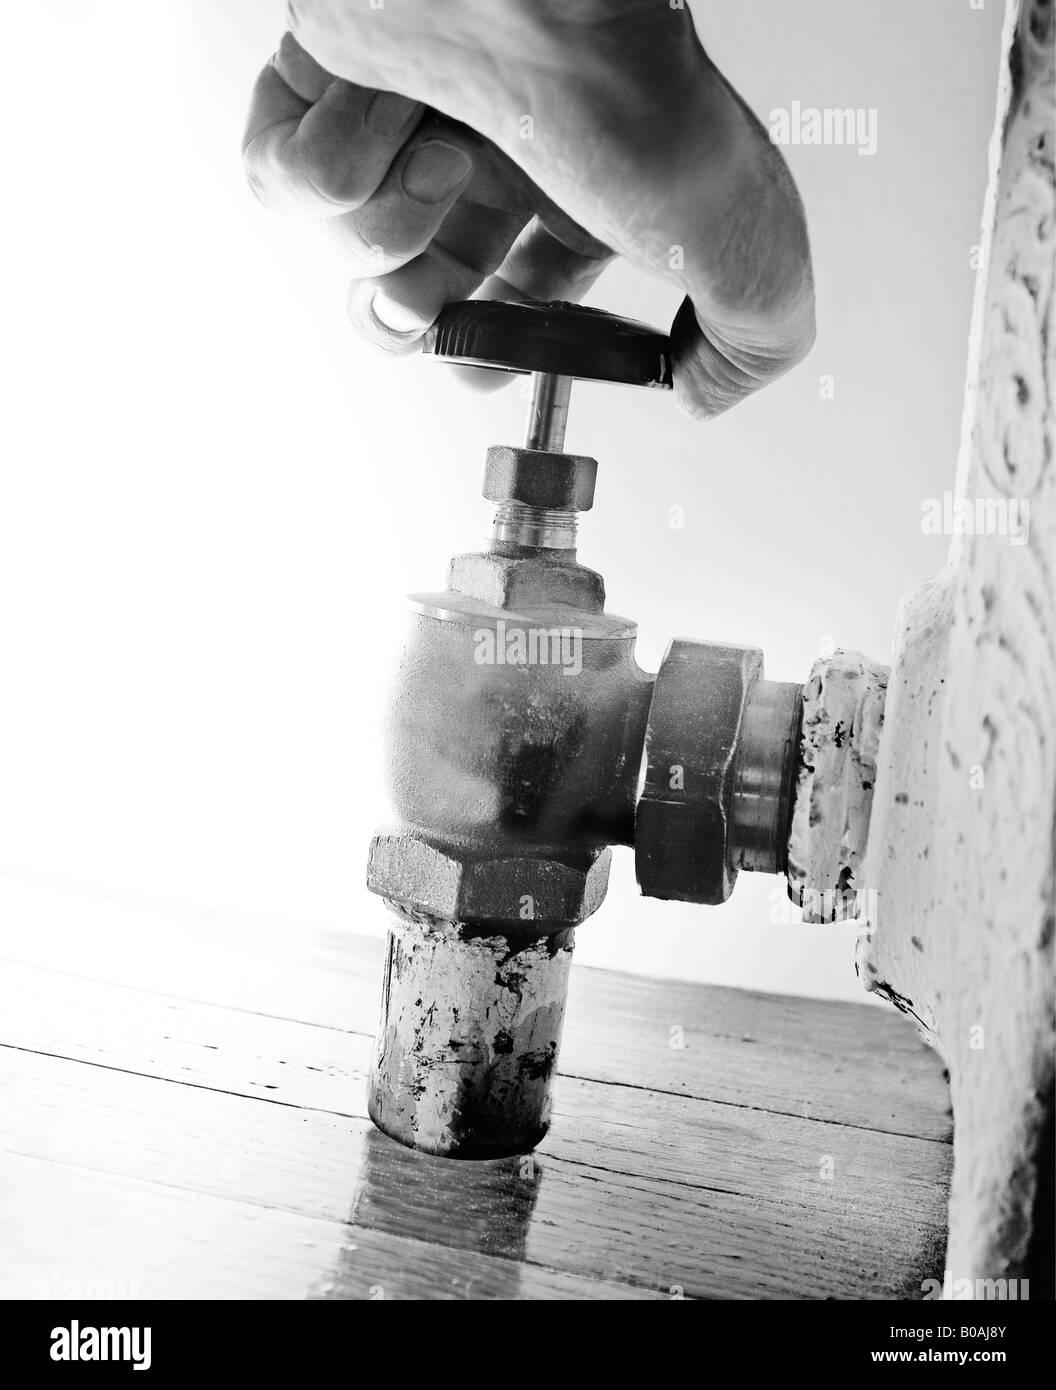 válvula del radiador Imagen De Stock